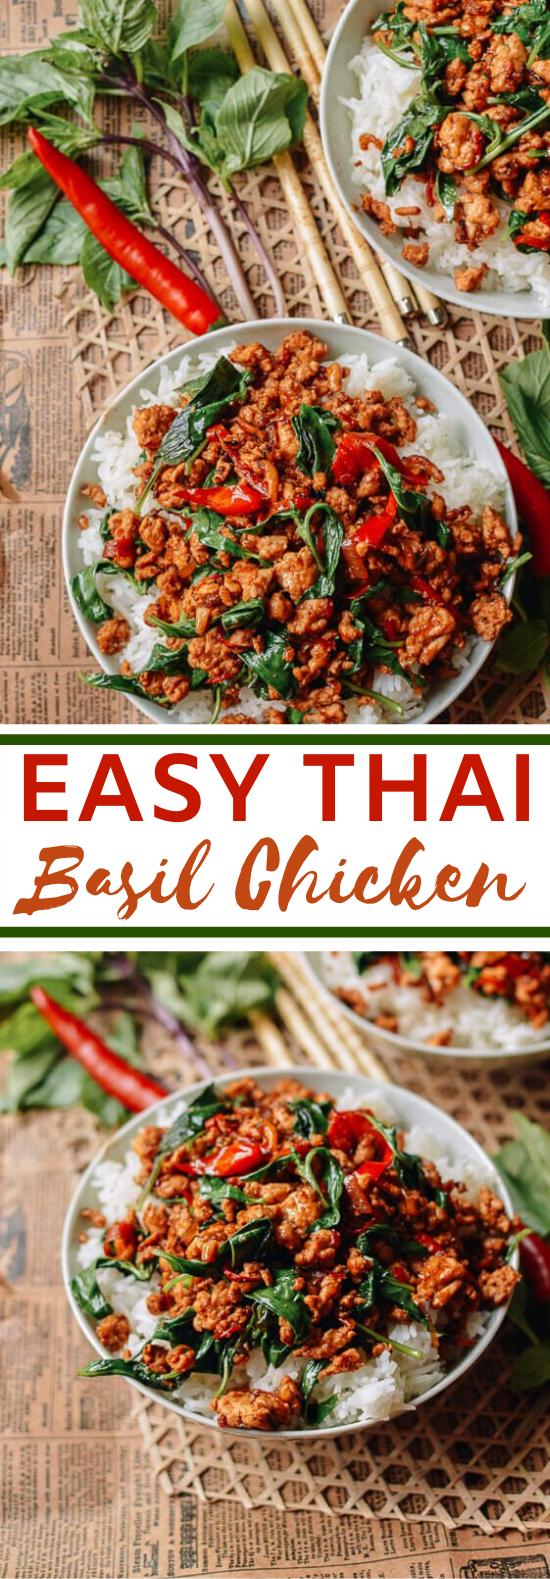 Thai Basil Chicken (Easy Gai Pad Krapow) #chicken #recipes #dinner #weeknight #asianfood